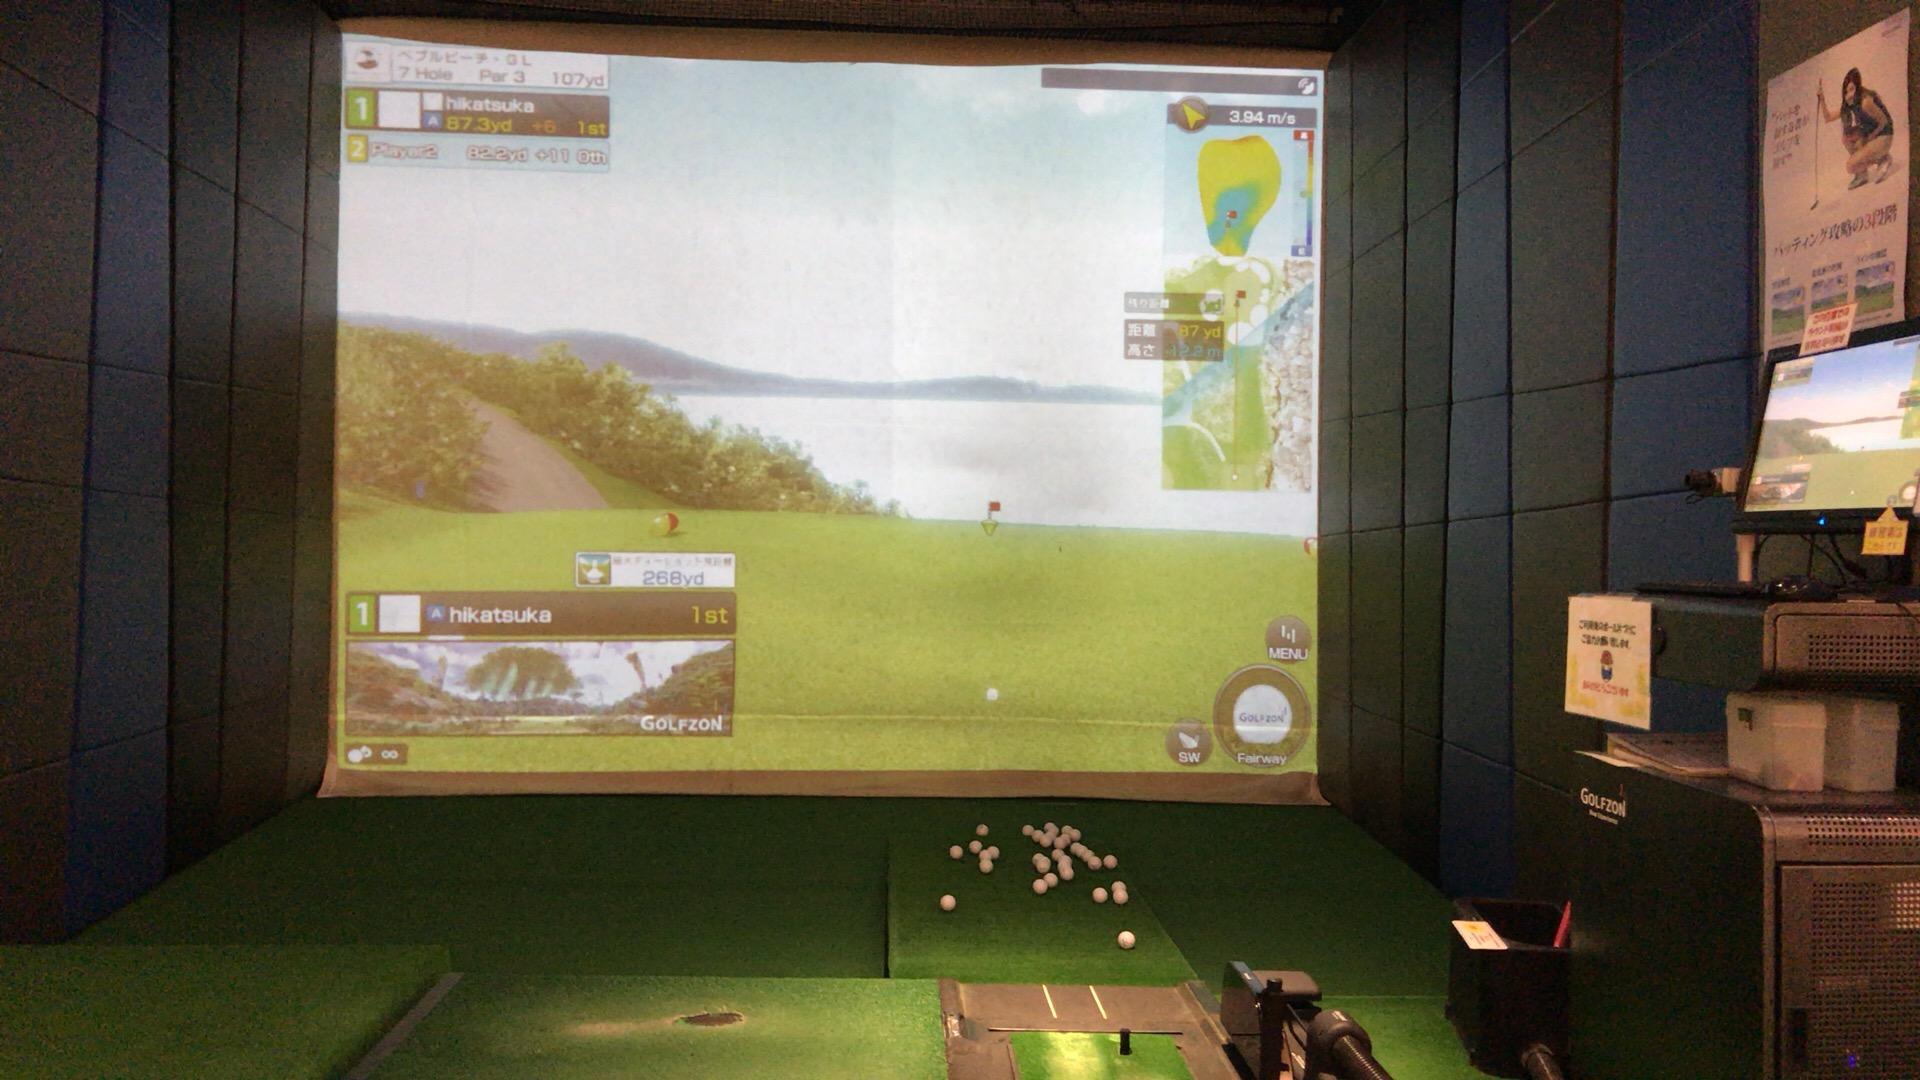 AQUA札幌でシミュレーションゴルフ@ペブル・ビーチ